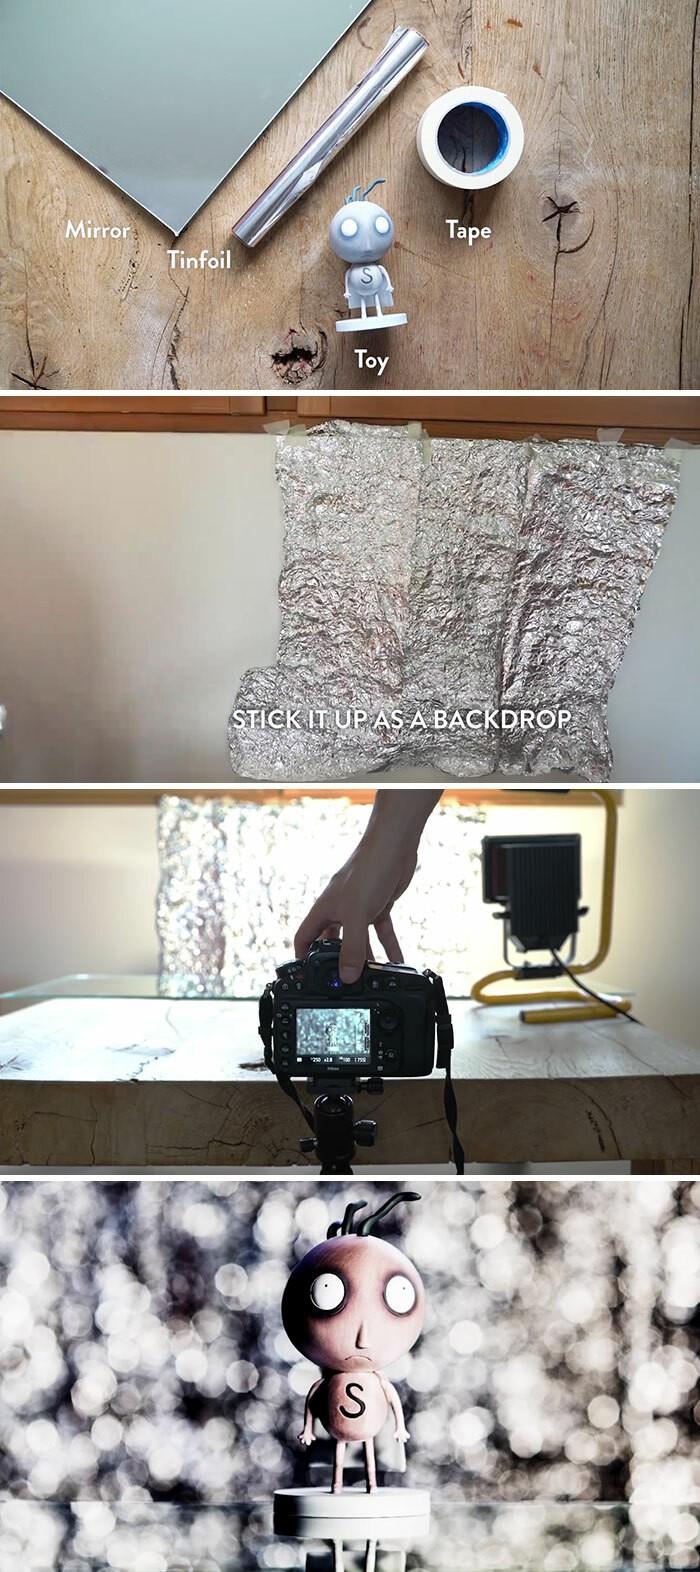 easy-camera-hacks-how-to-improve-photography-skills-16-596f57e3116c7__700